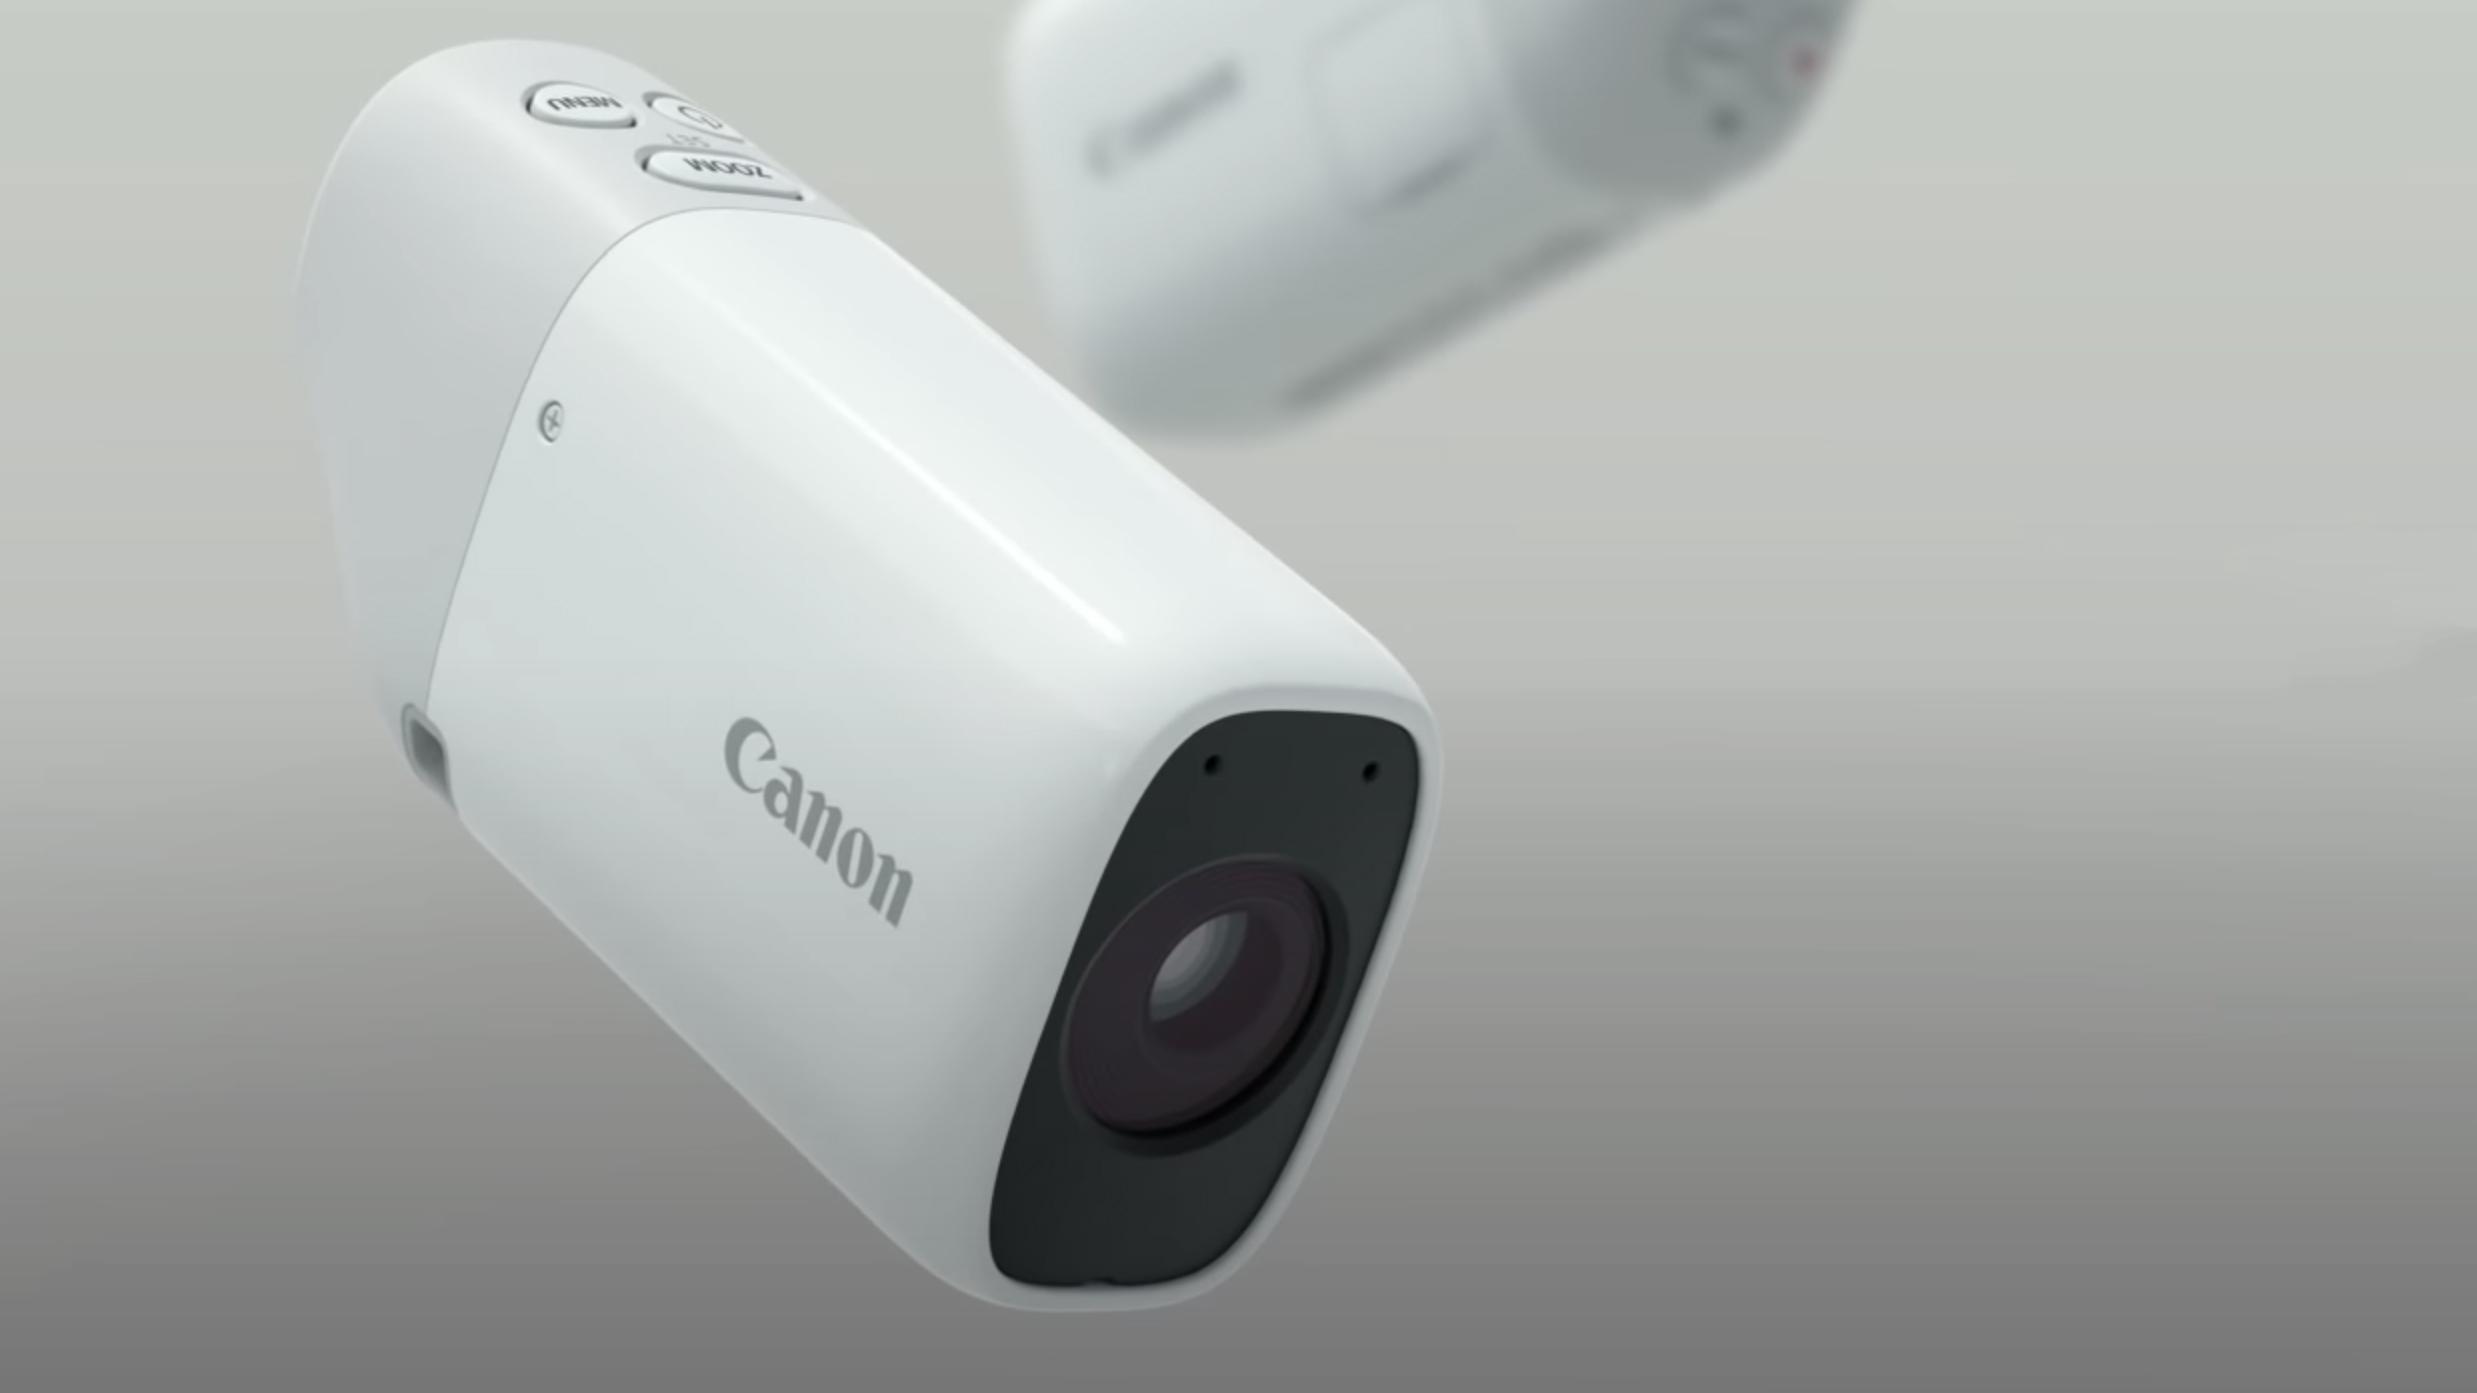 The bizarre Canon Powershot Zoom looks like the future of compact cameras    TechRadar